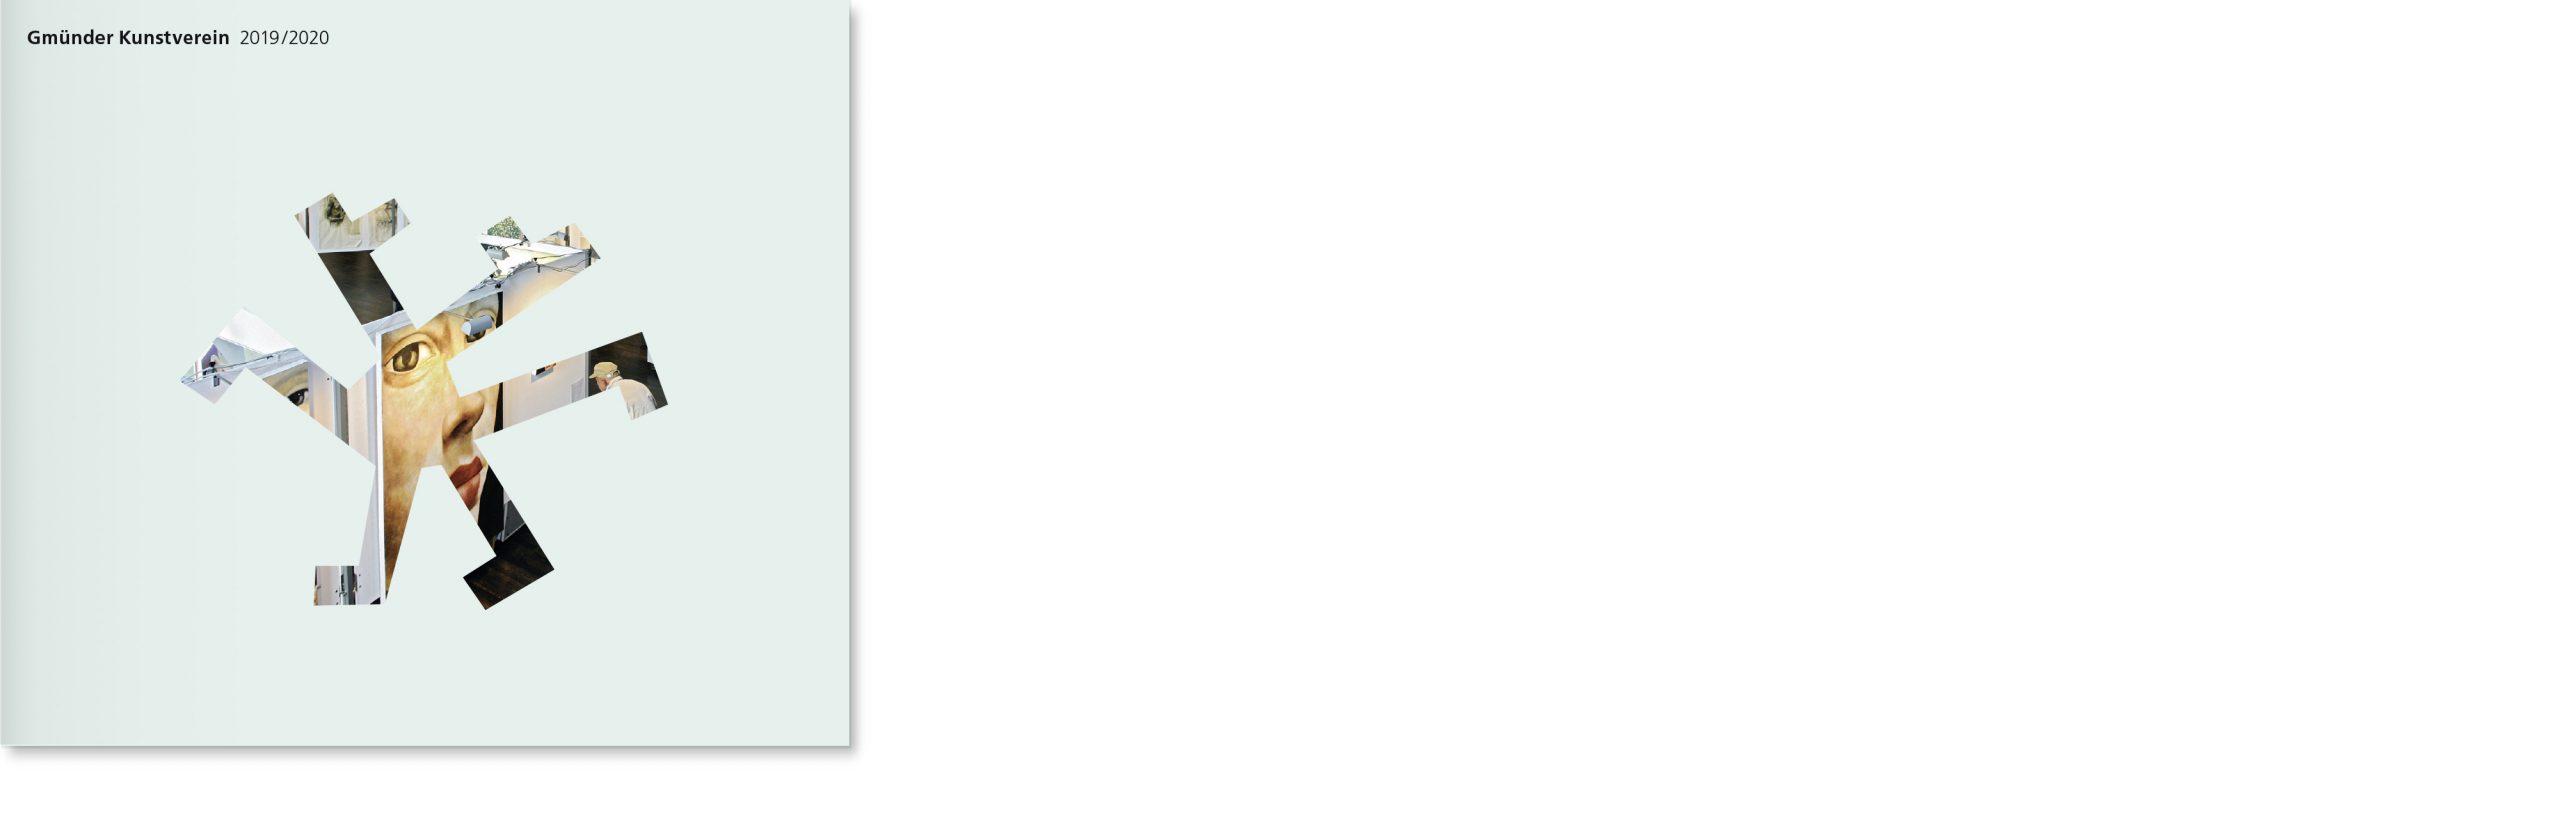 fh-web-kunstverein-programmheft-2019-titel-1-scaled.jpg